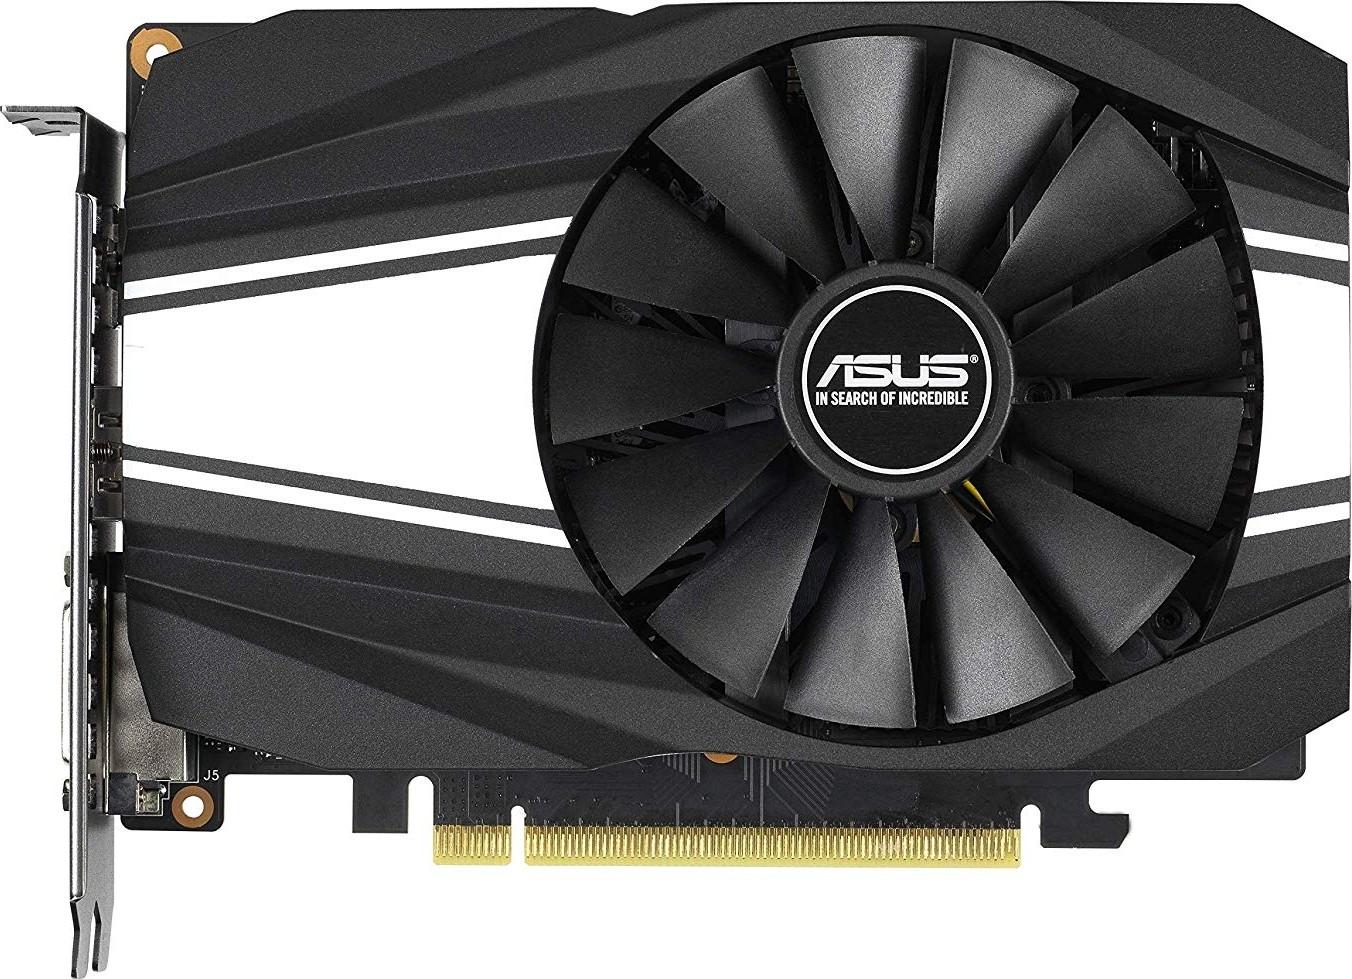 Image result for ASUS Phoenix GeForce® GTX 1660 Ti 6GB GDDR6